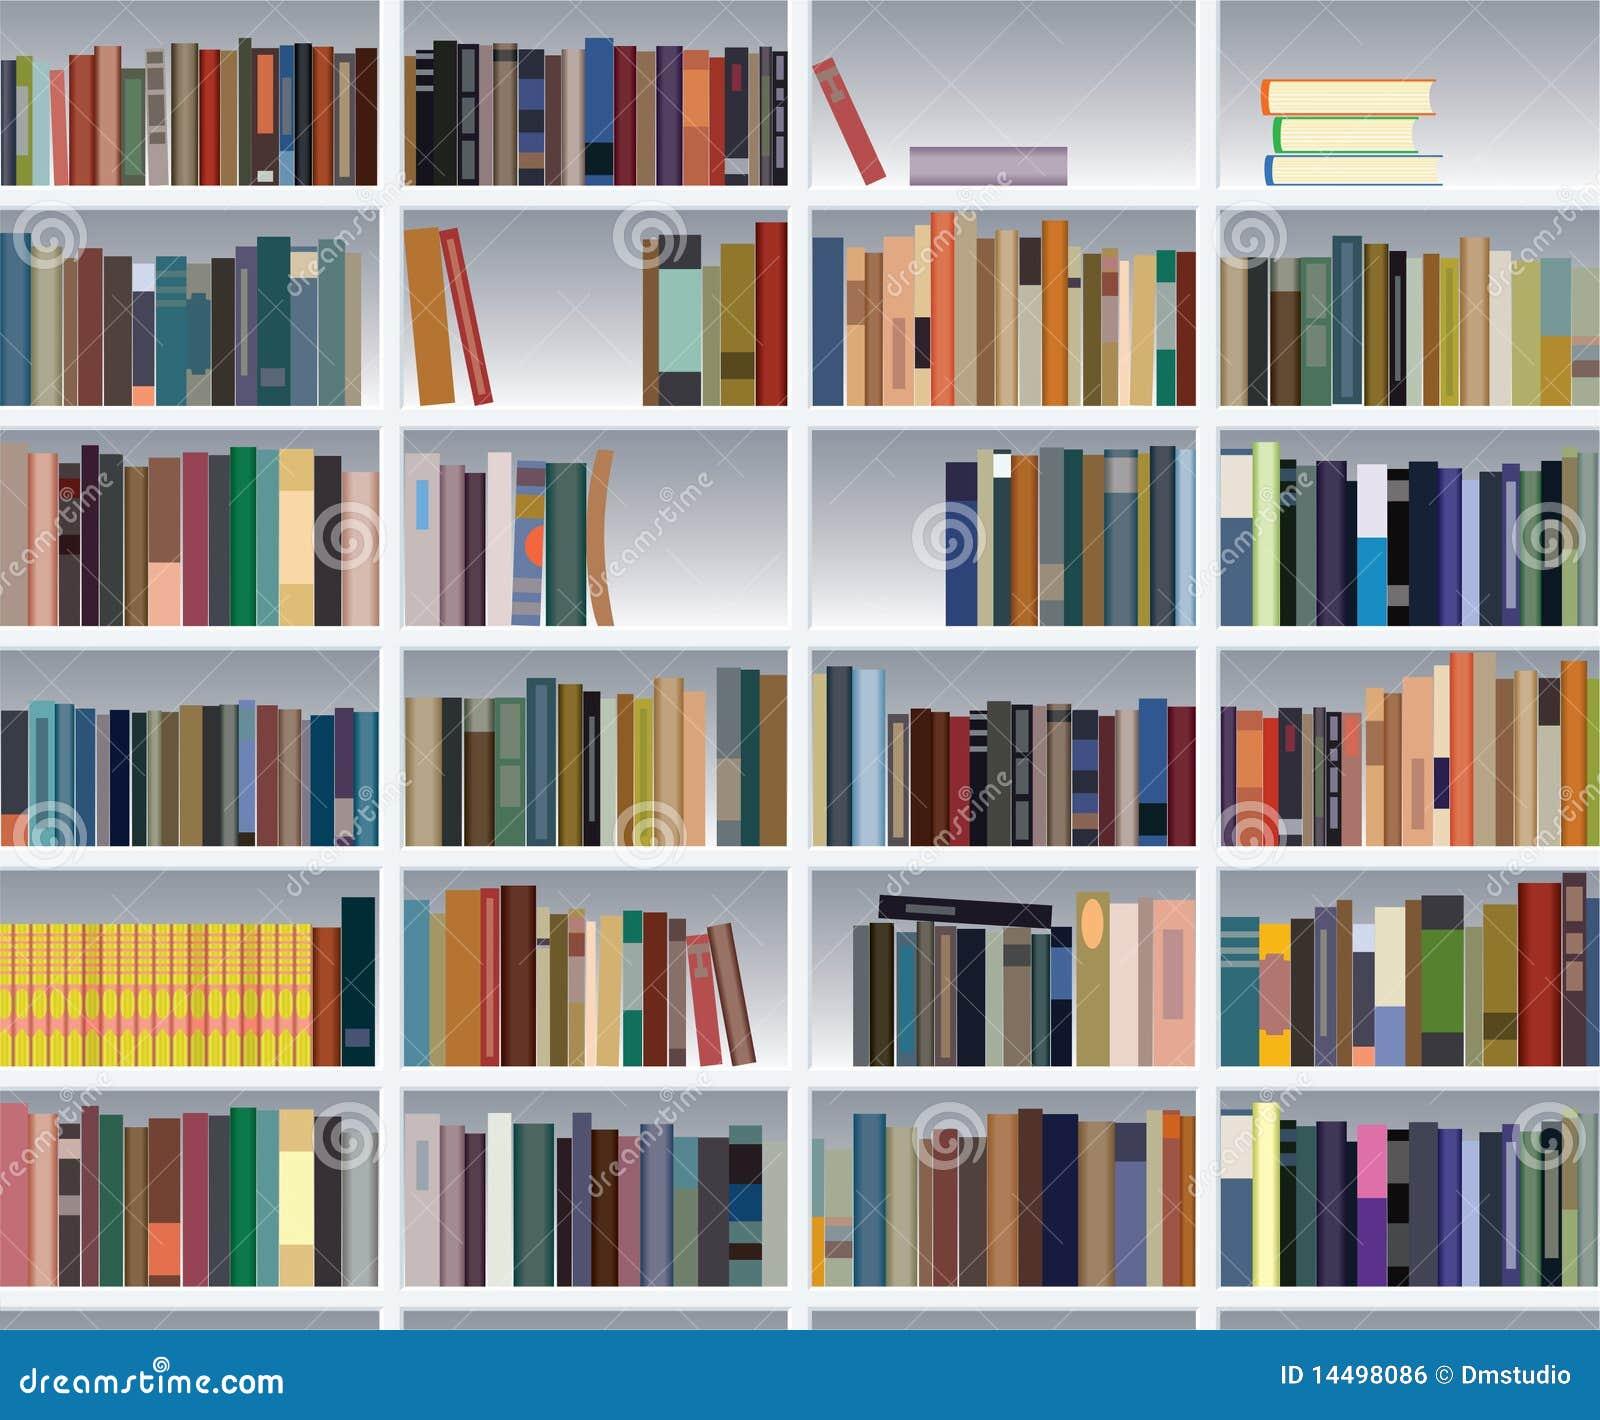 Modernes Bücherregal Lizenzfreies Stockbild  Bild 14498086